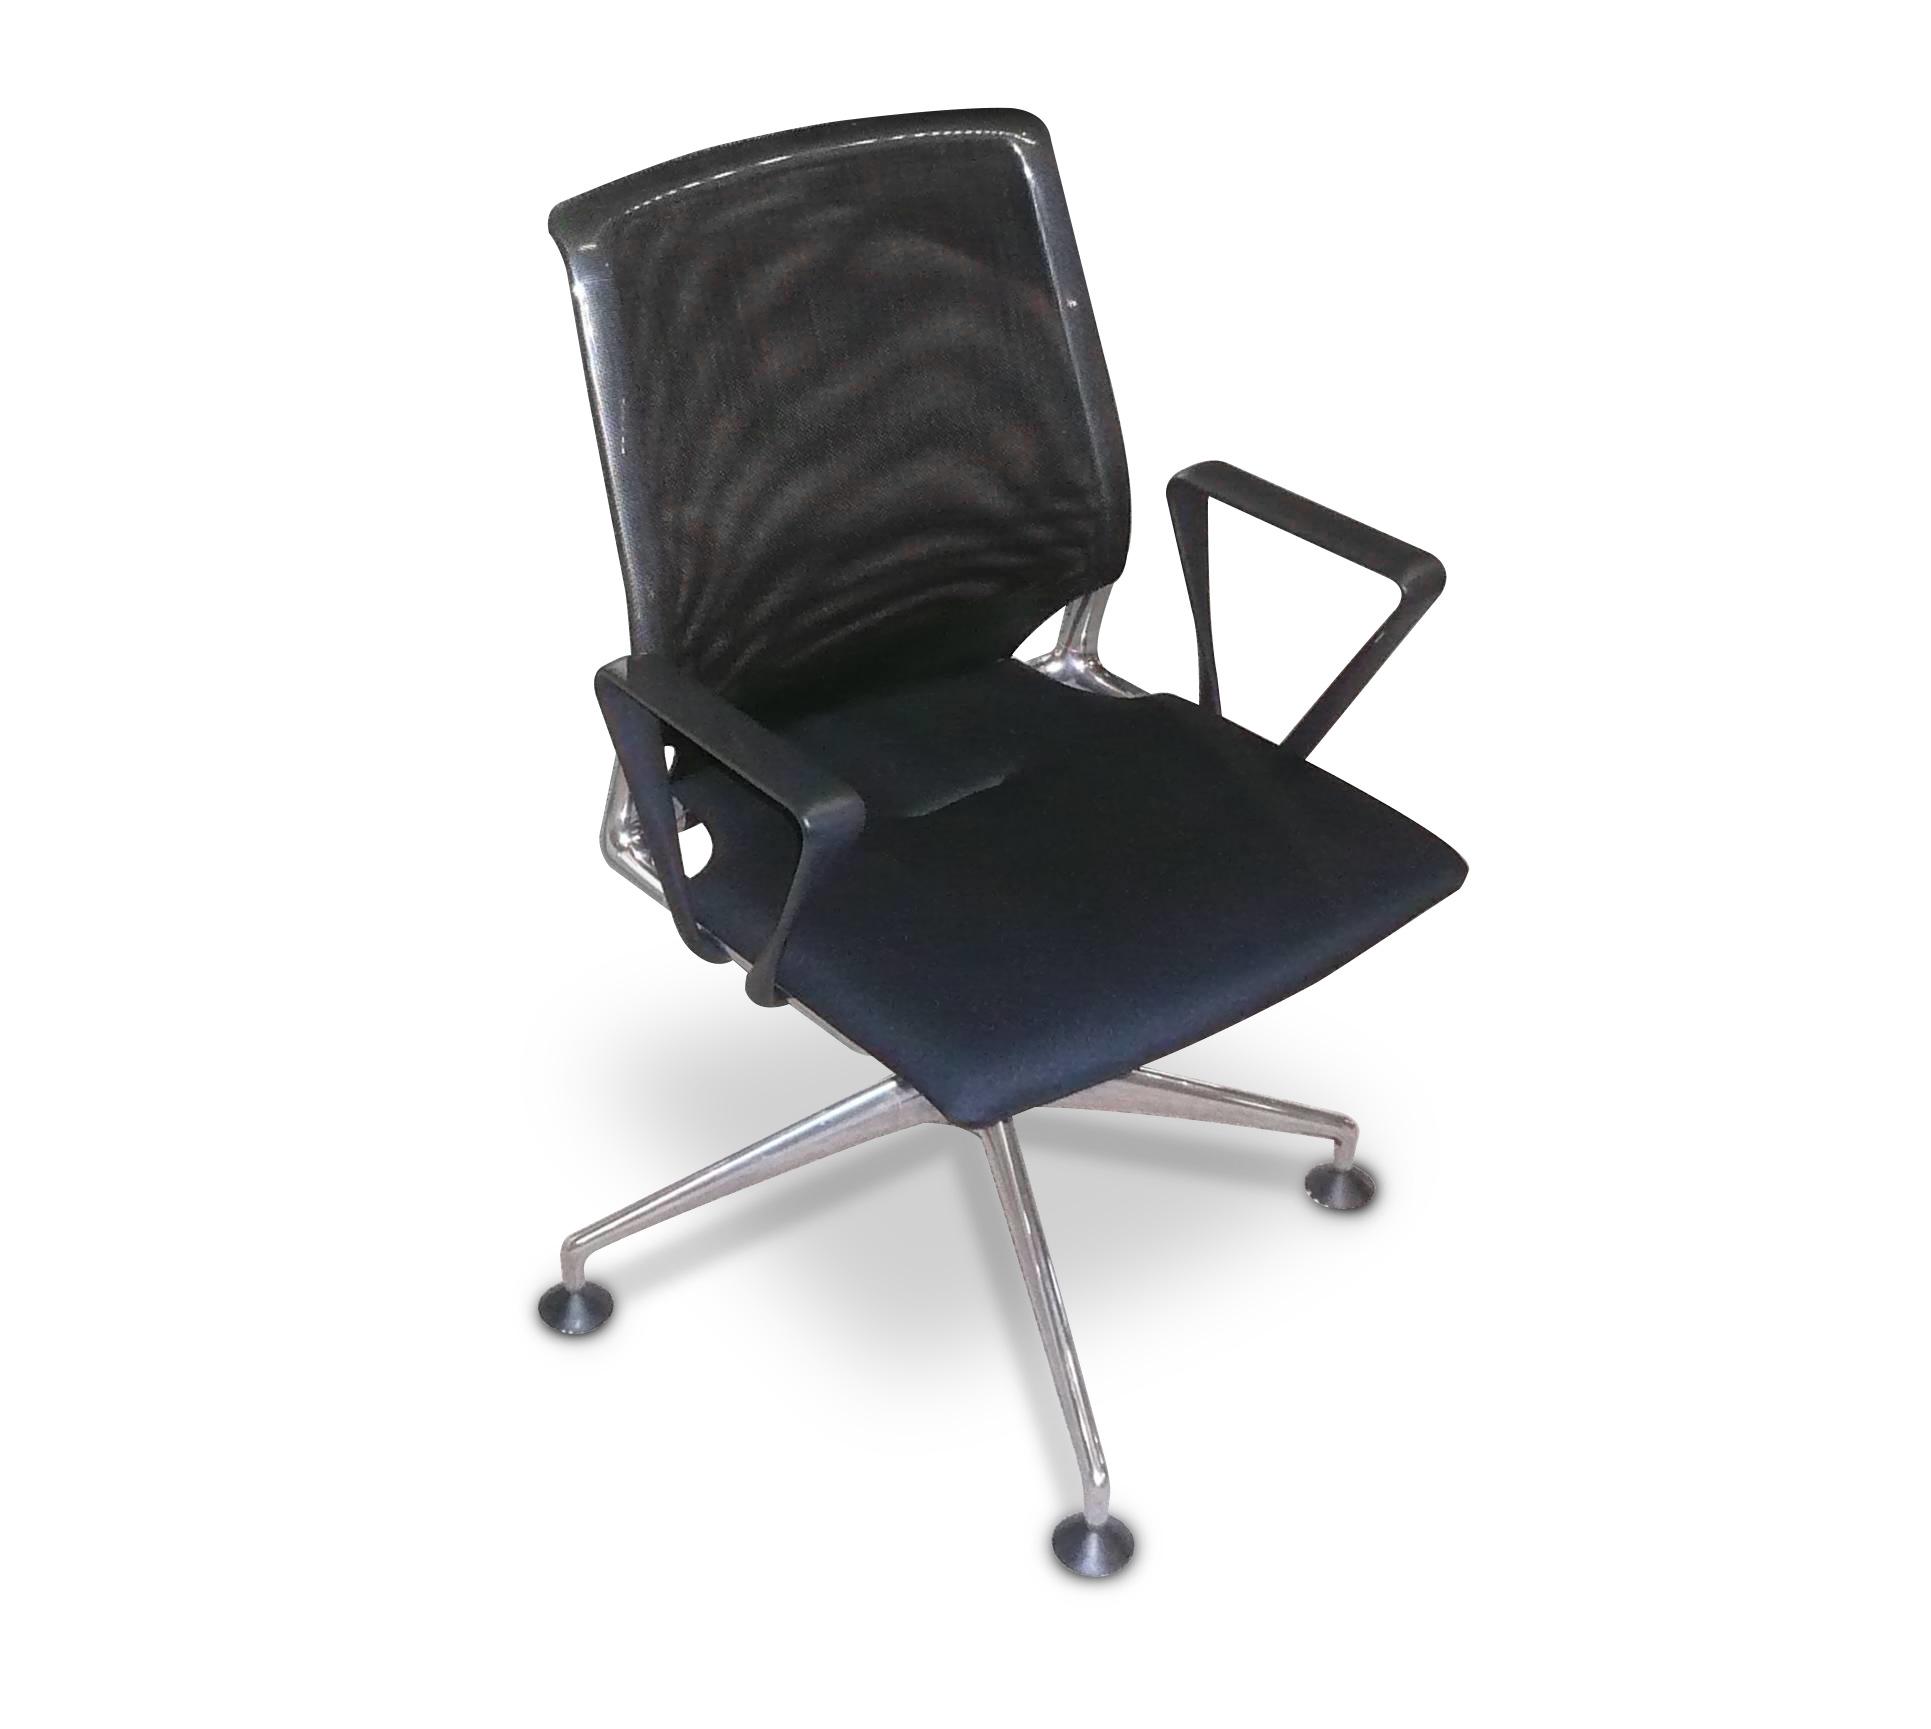 1544531003-buero-konferenzstuhl-mod-meda-chair.jpg